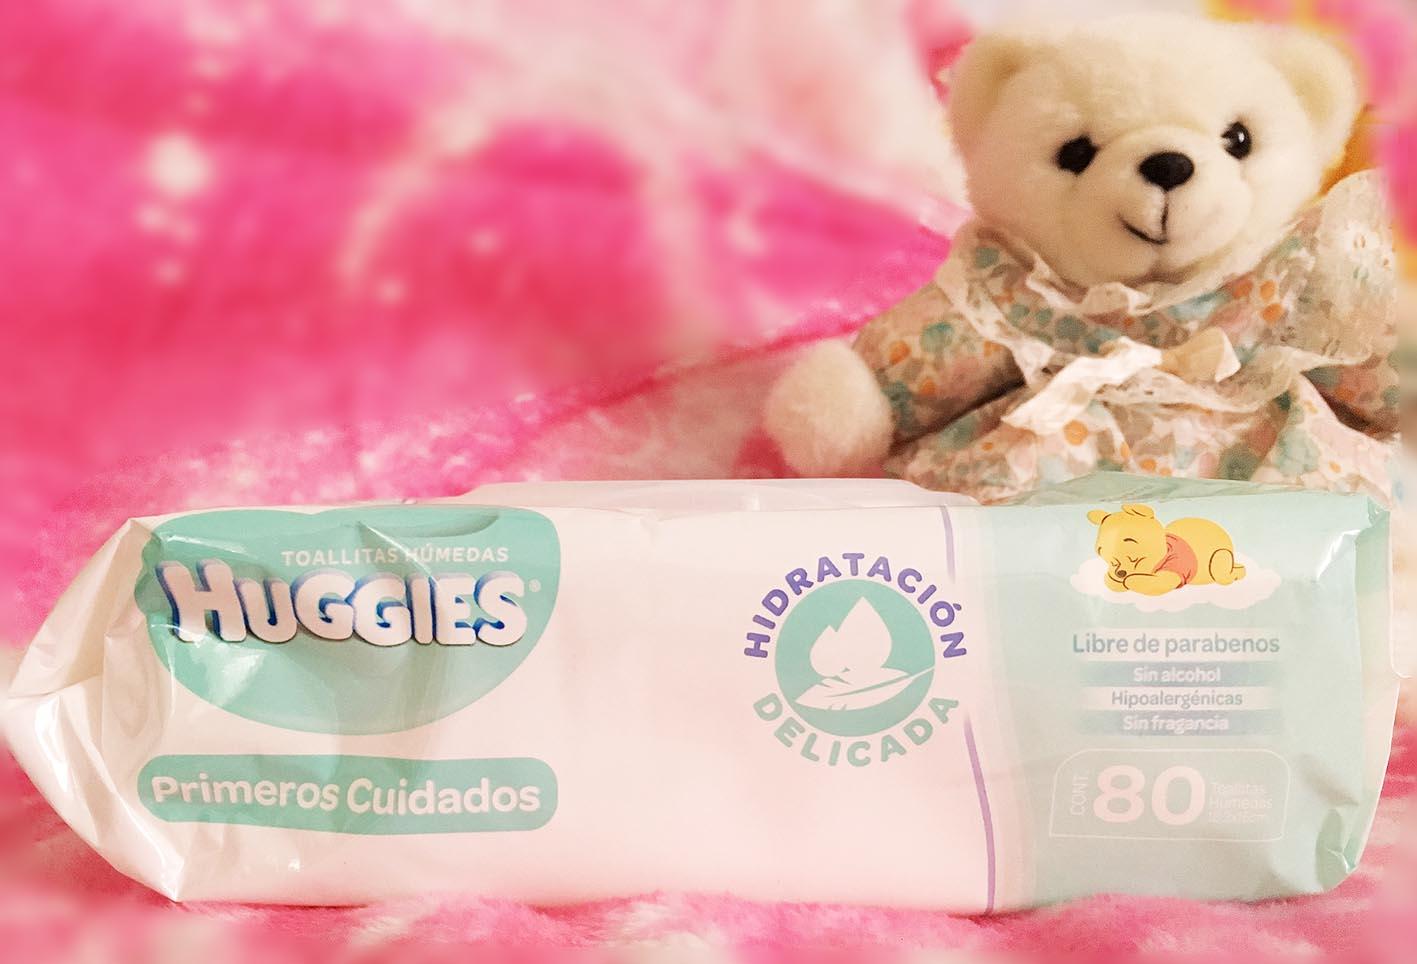 Toallitas Húmedas Huggies® Primeros Cuidados